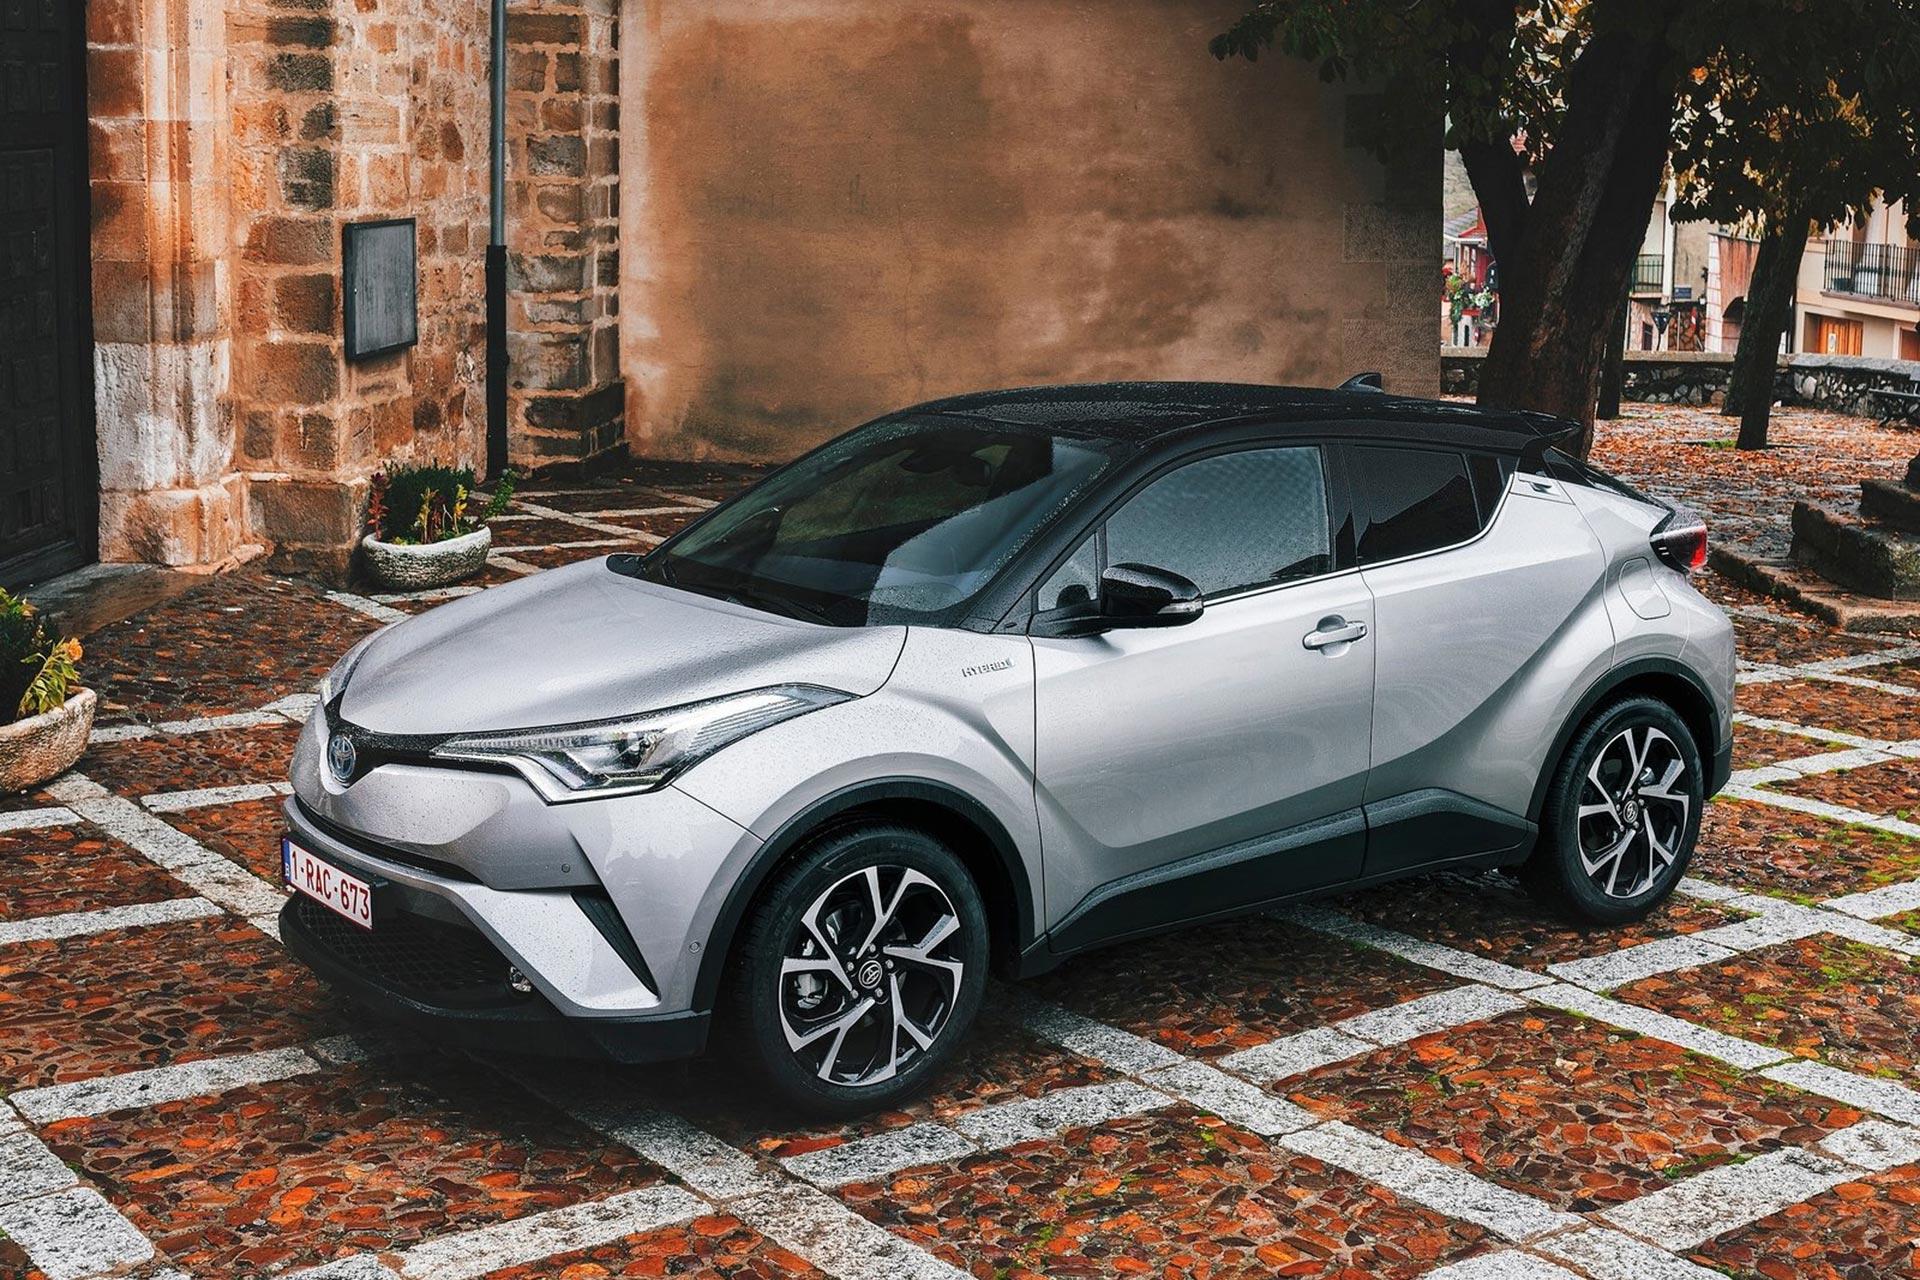 Toyota-C-HR-2017-1600-0a.jpg